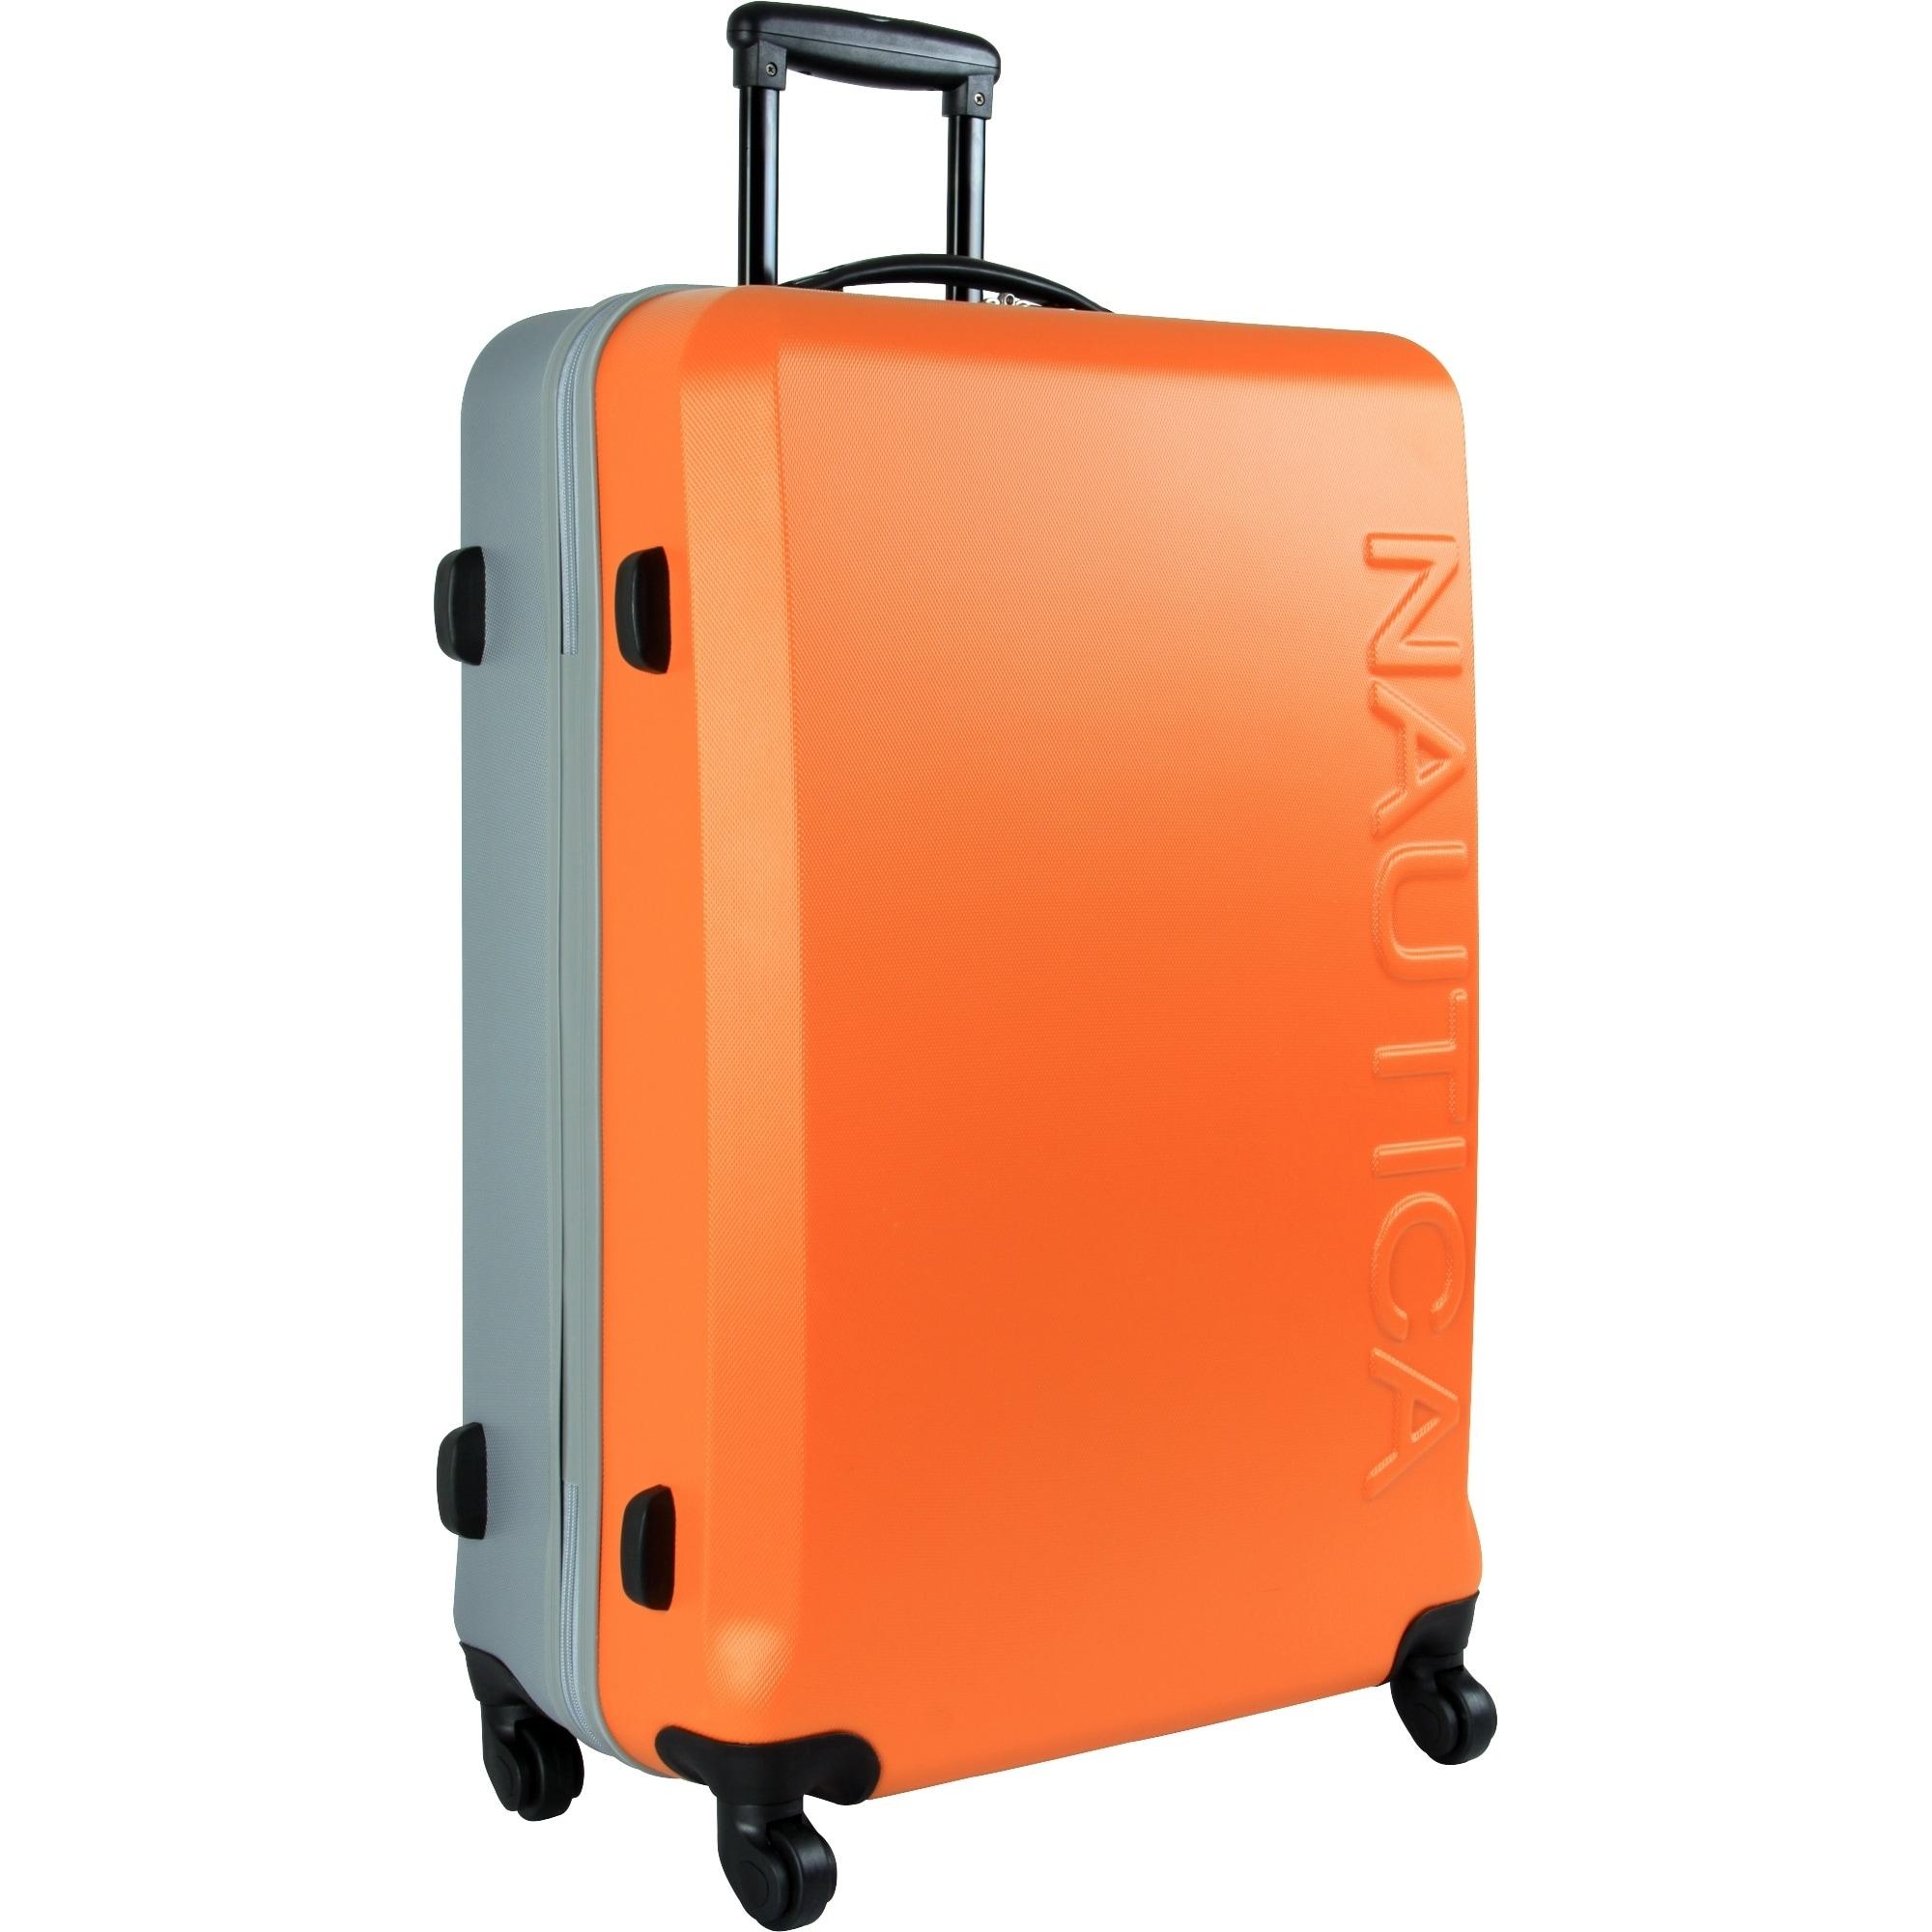 01733838ed11 Nautica Ahoy 28 inch hardside spinner luggage